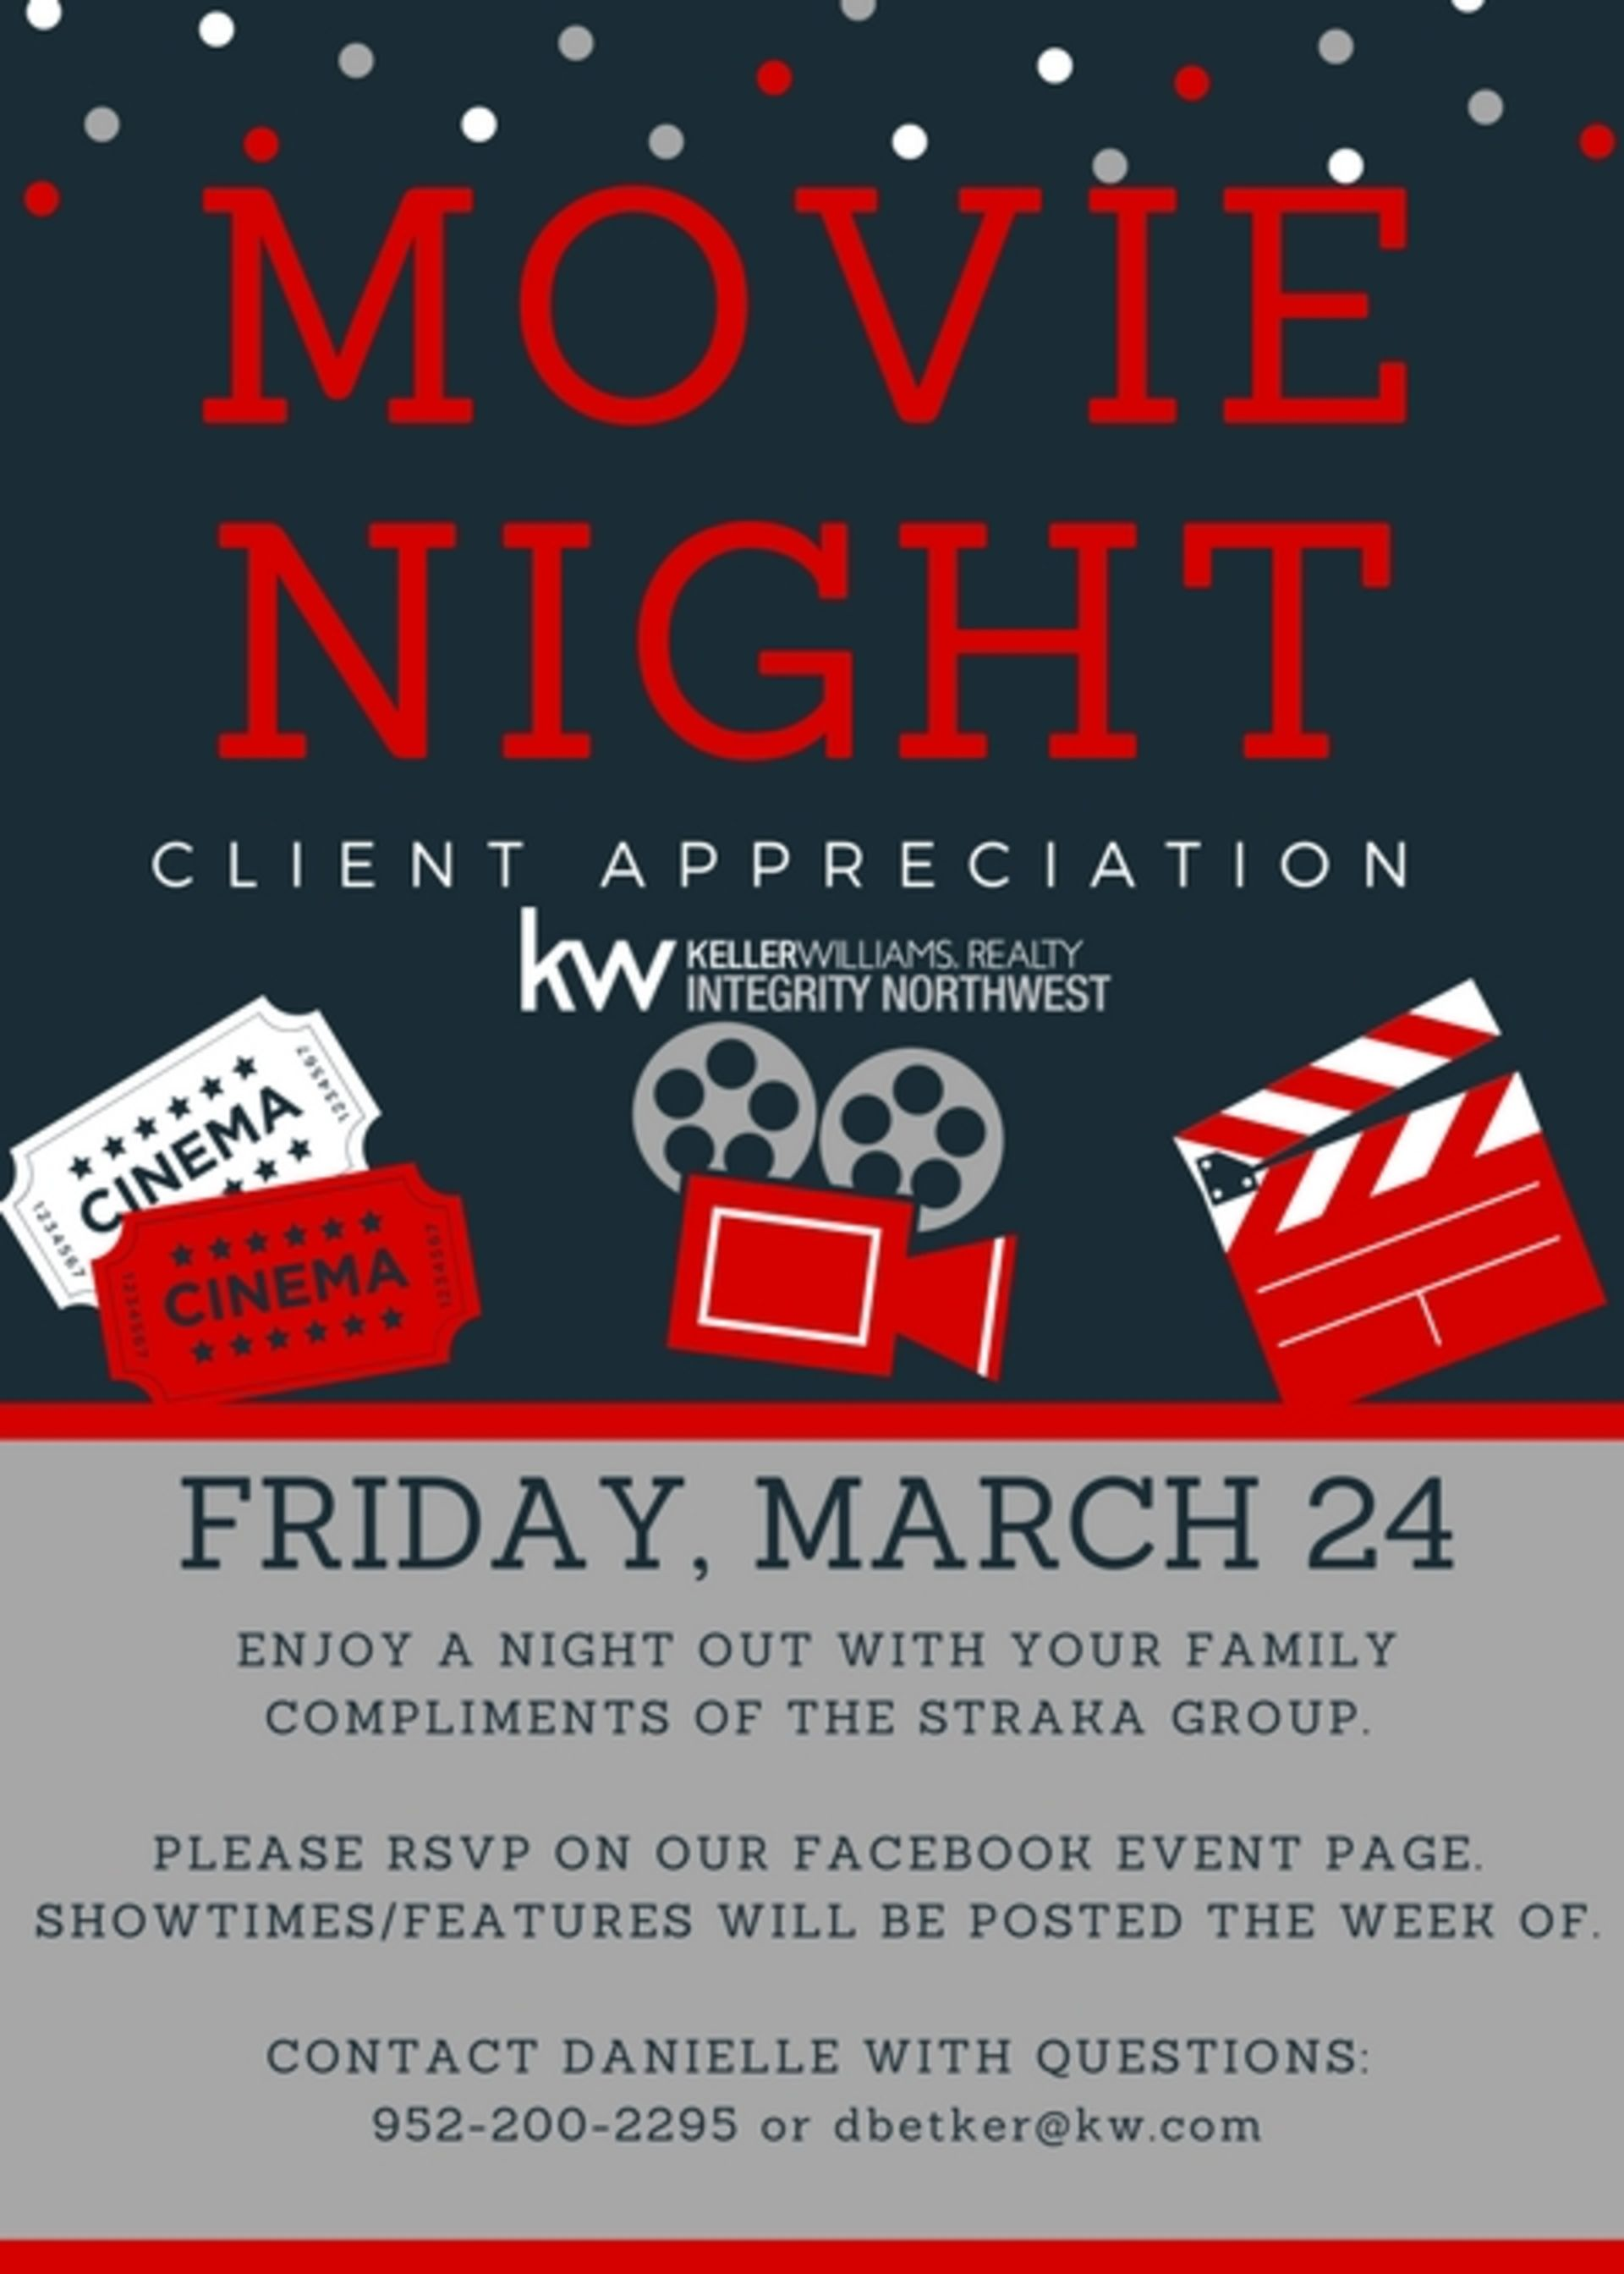 Client Appreciation Movie Night – Friday March 24